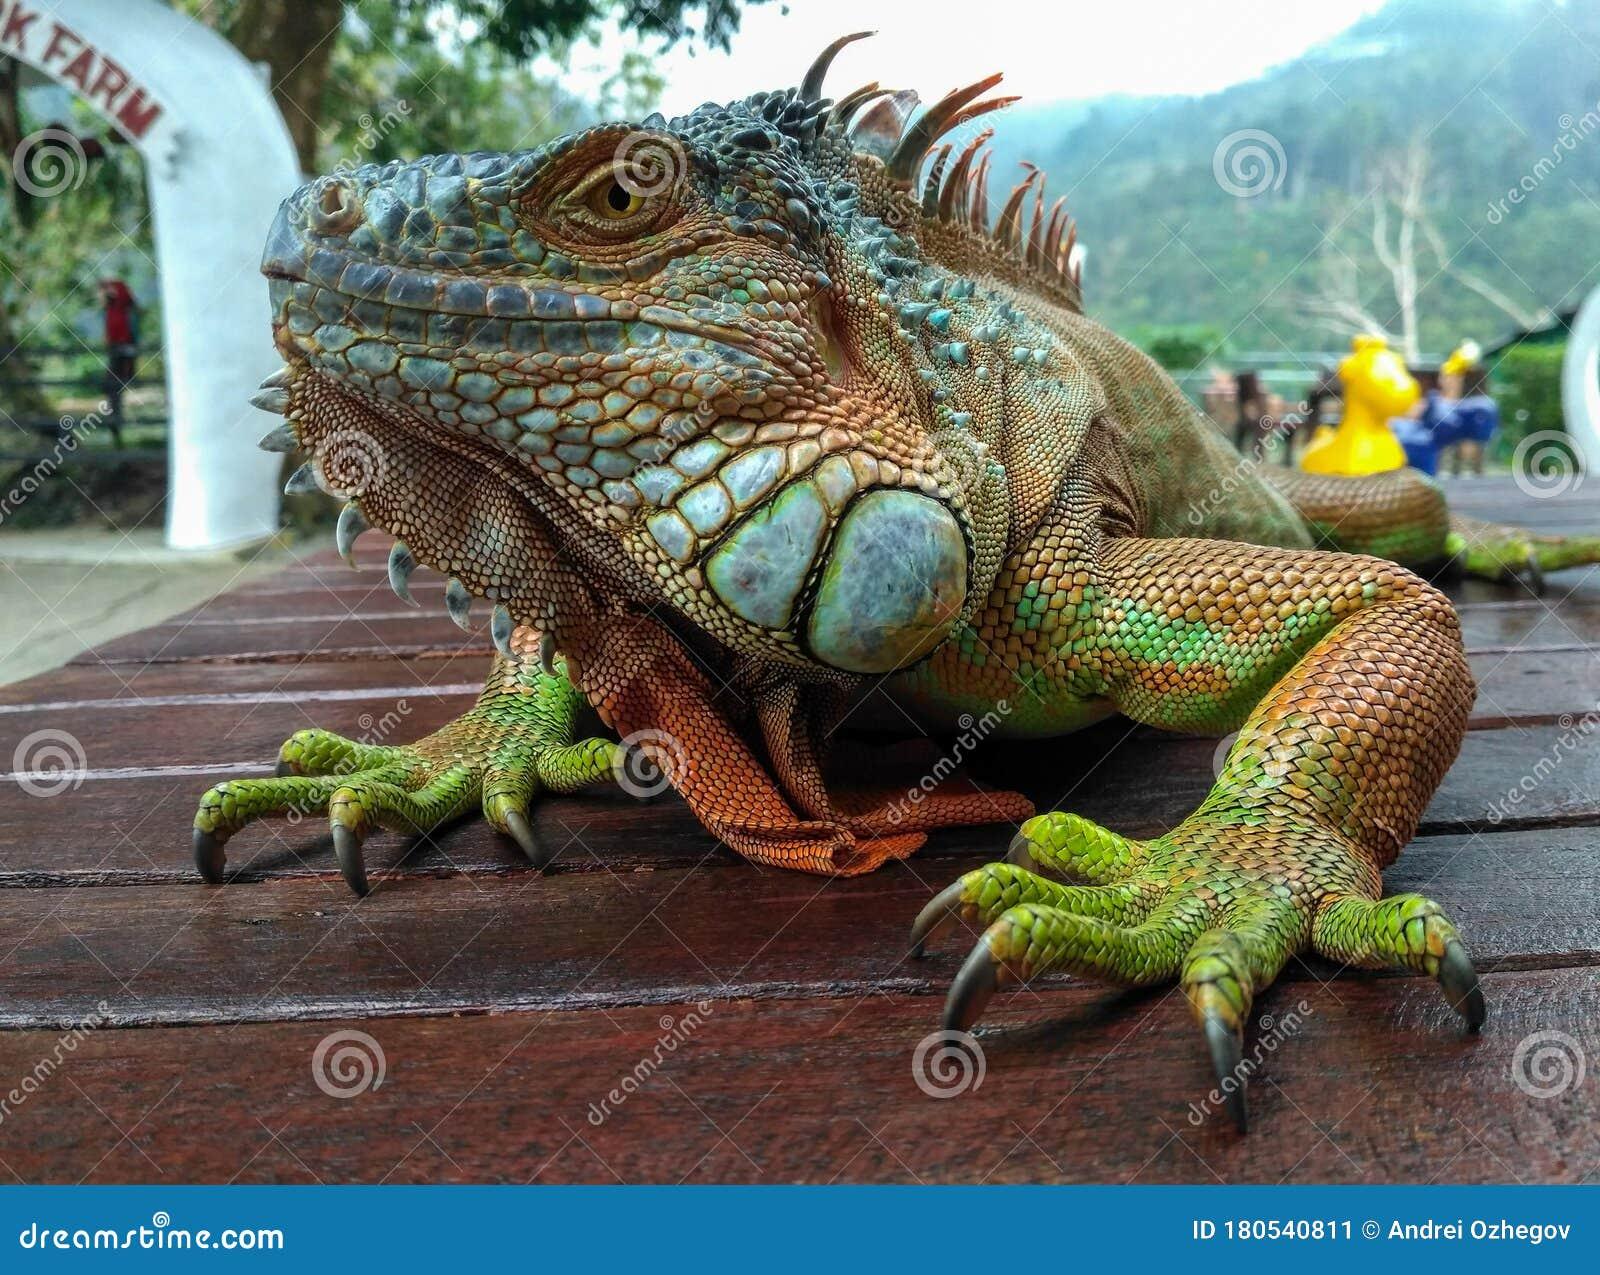 719 Blue Orange Iguana Photos Free Royalty Free Stock Photos From Dreamstime Iguana red head blue body images free